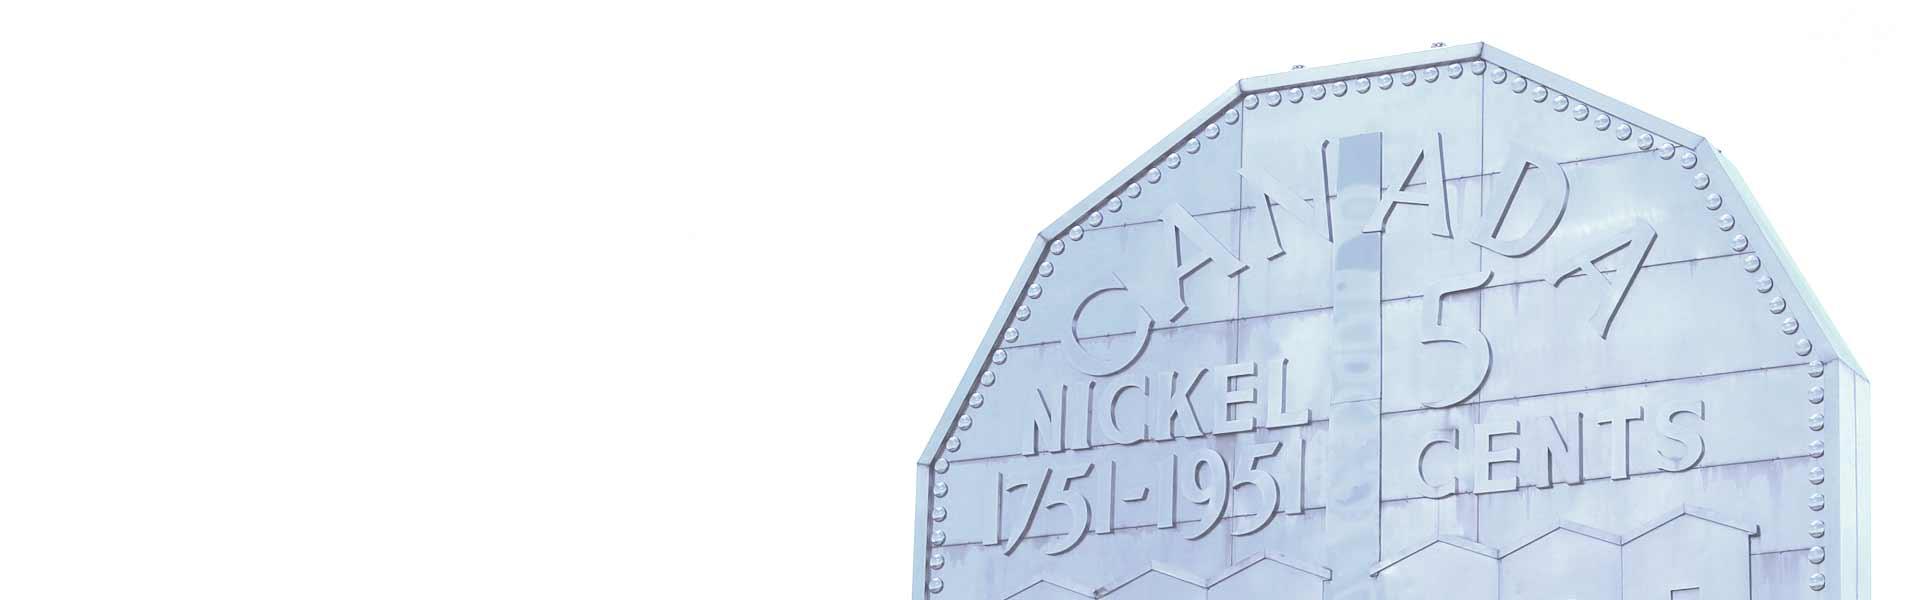 MEIC Sudbury Nickel